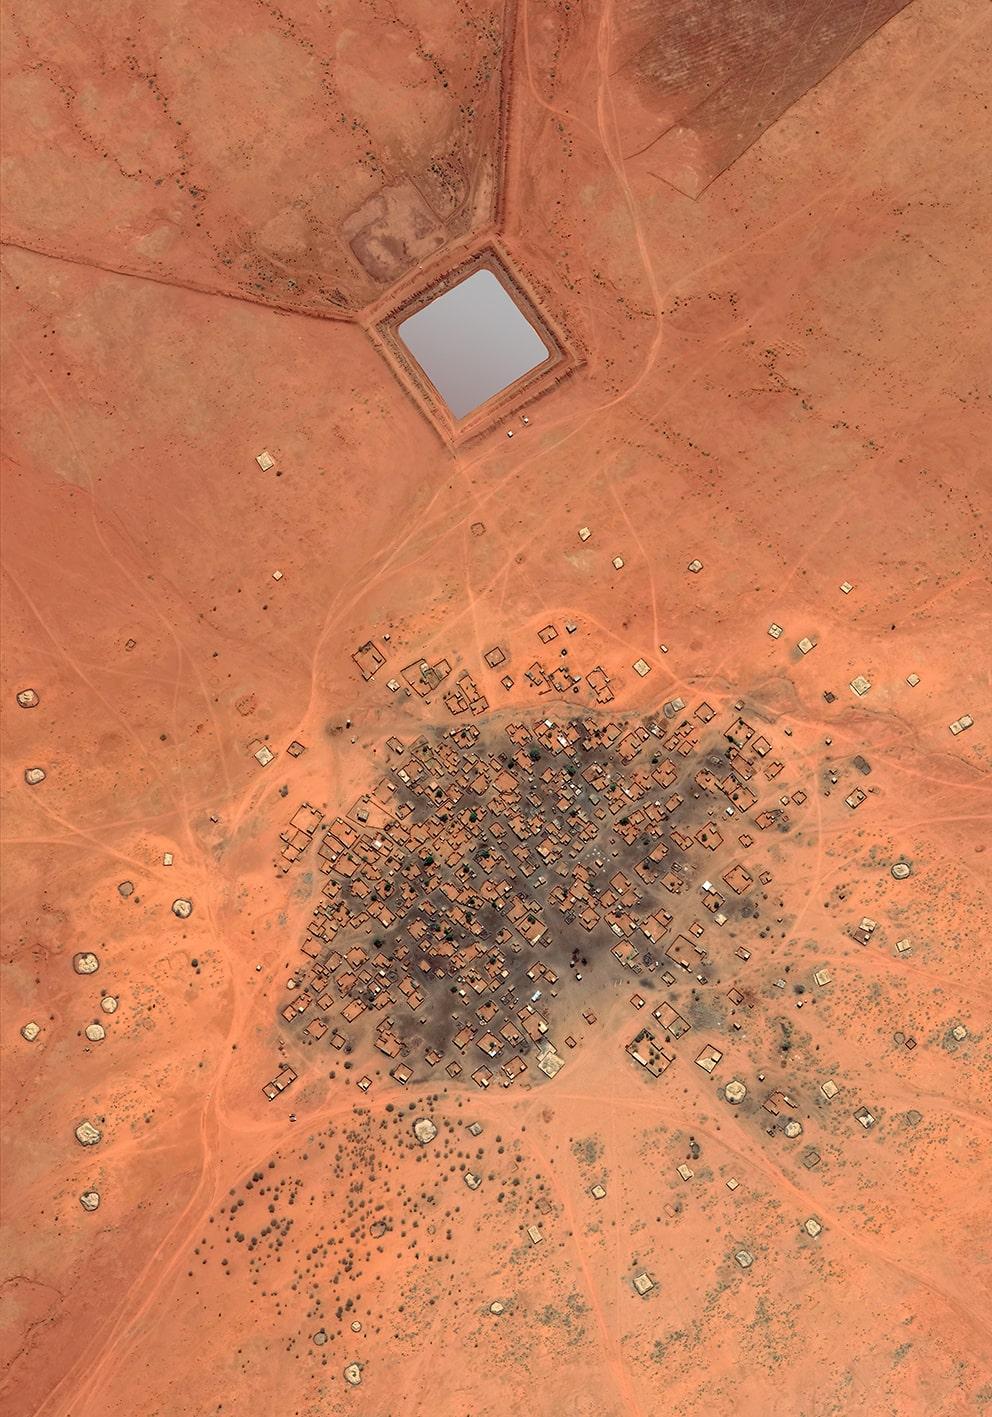 Human's City 10 Sudan, with mirror, 2020, cm 120×84, 1:9